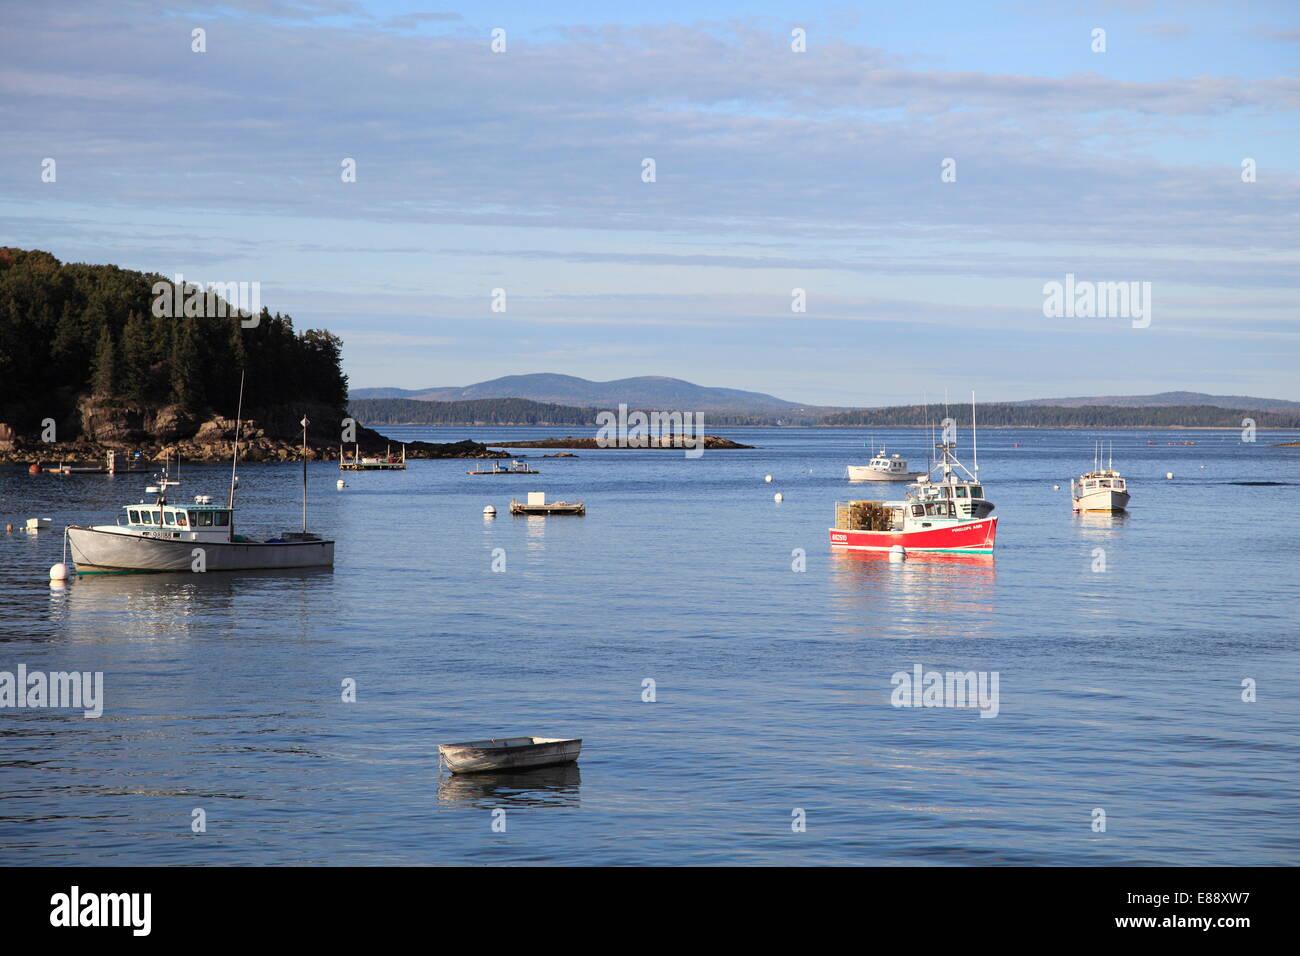 Fishing boats, Bar Harbor, Mount Desert Island, Maine, New England, United States of America, North America - Stock Image